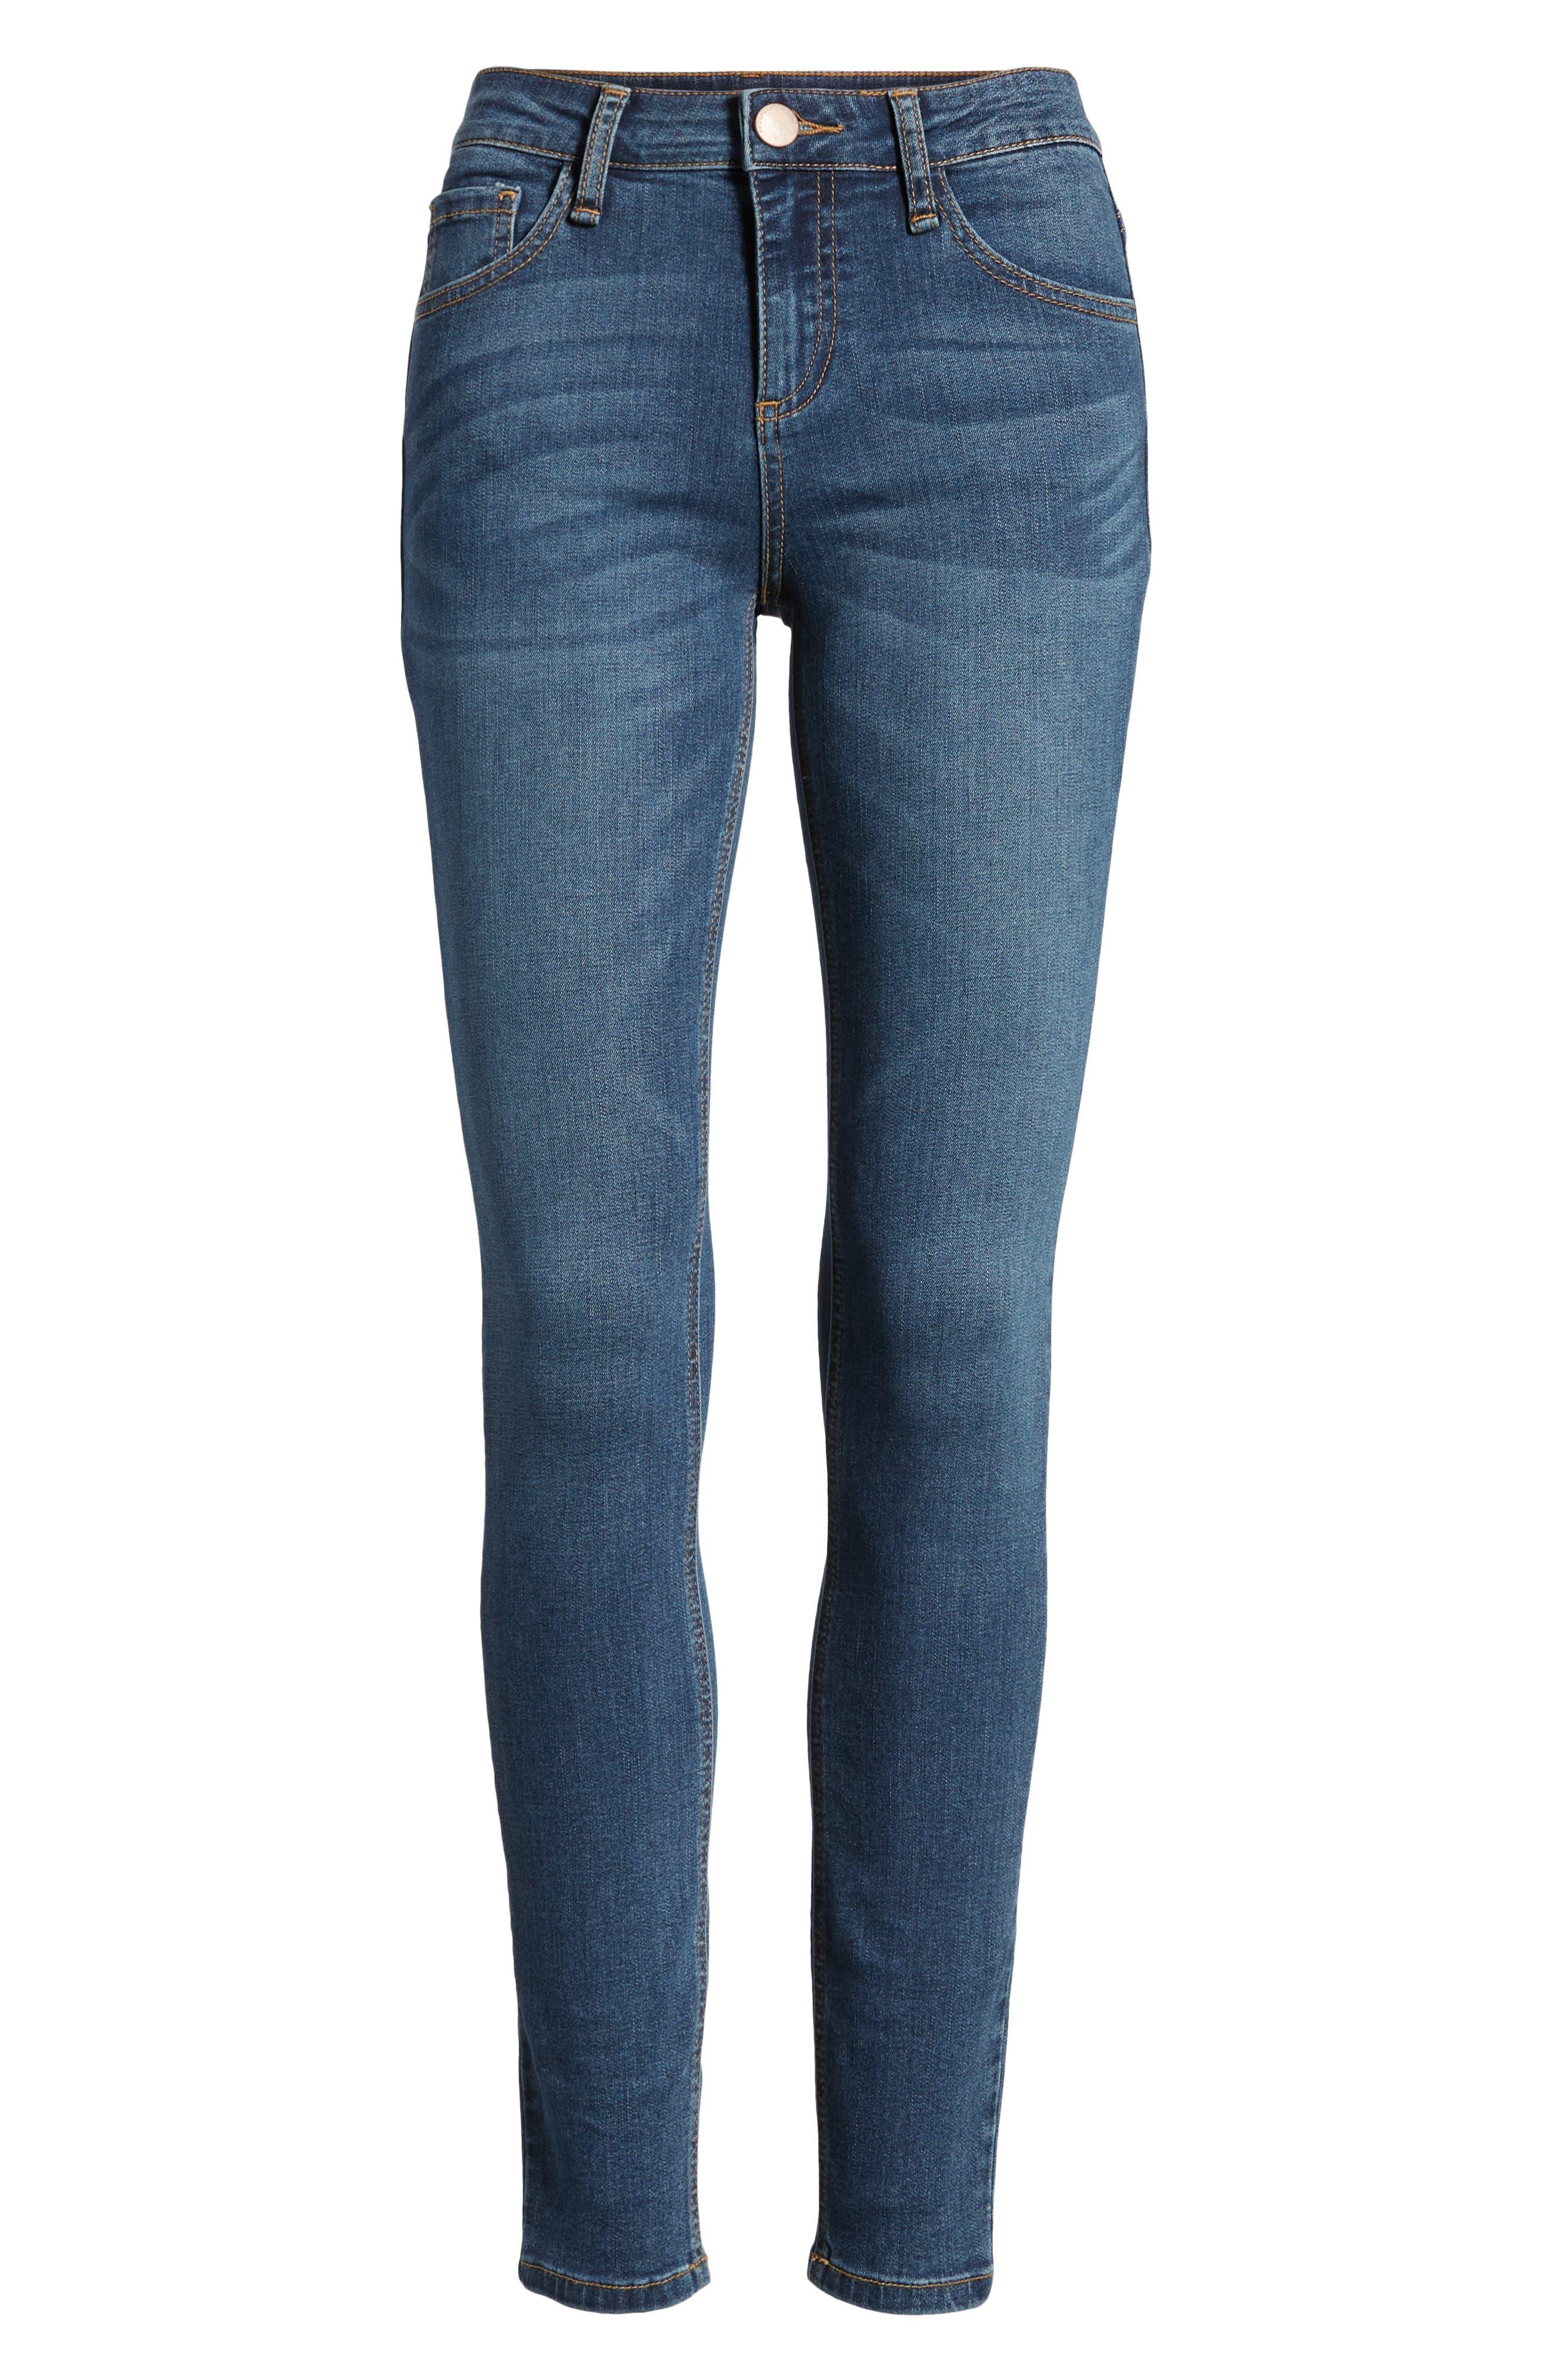 Skinny Jeans,                             Alternate thumbnail 7, color,